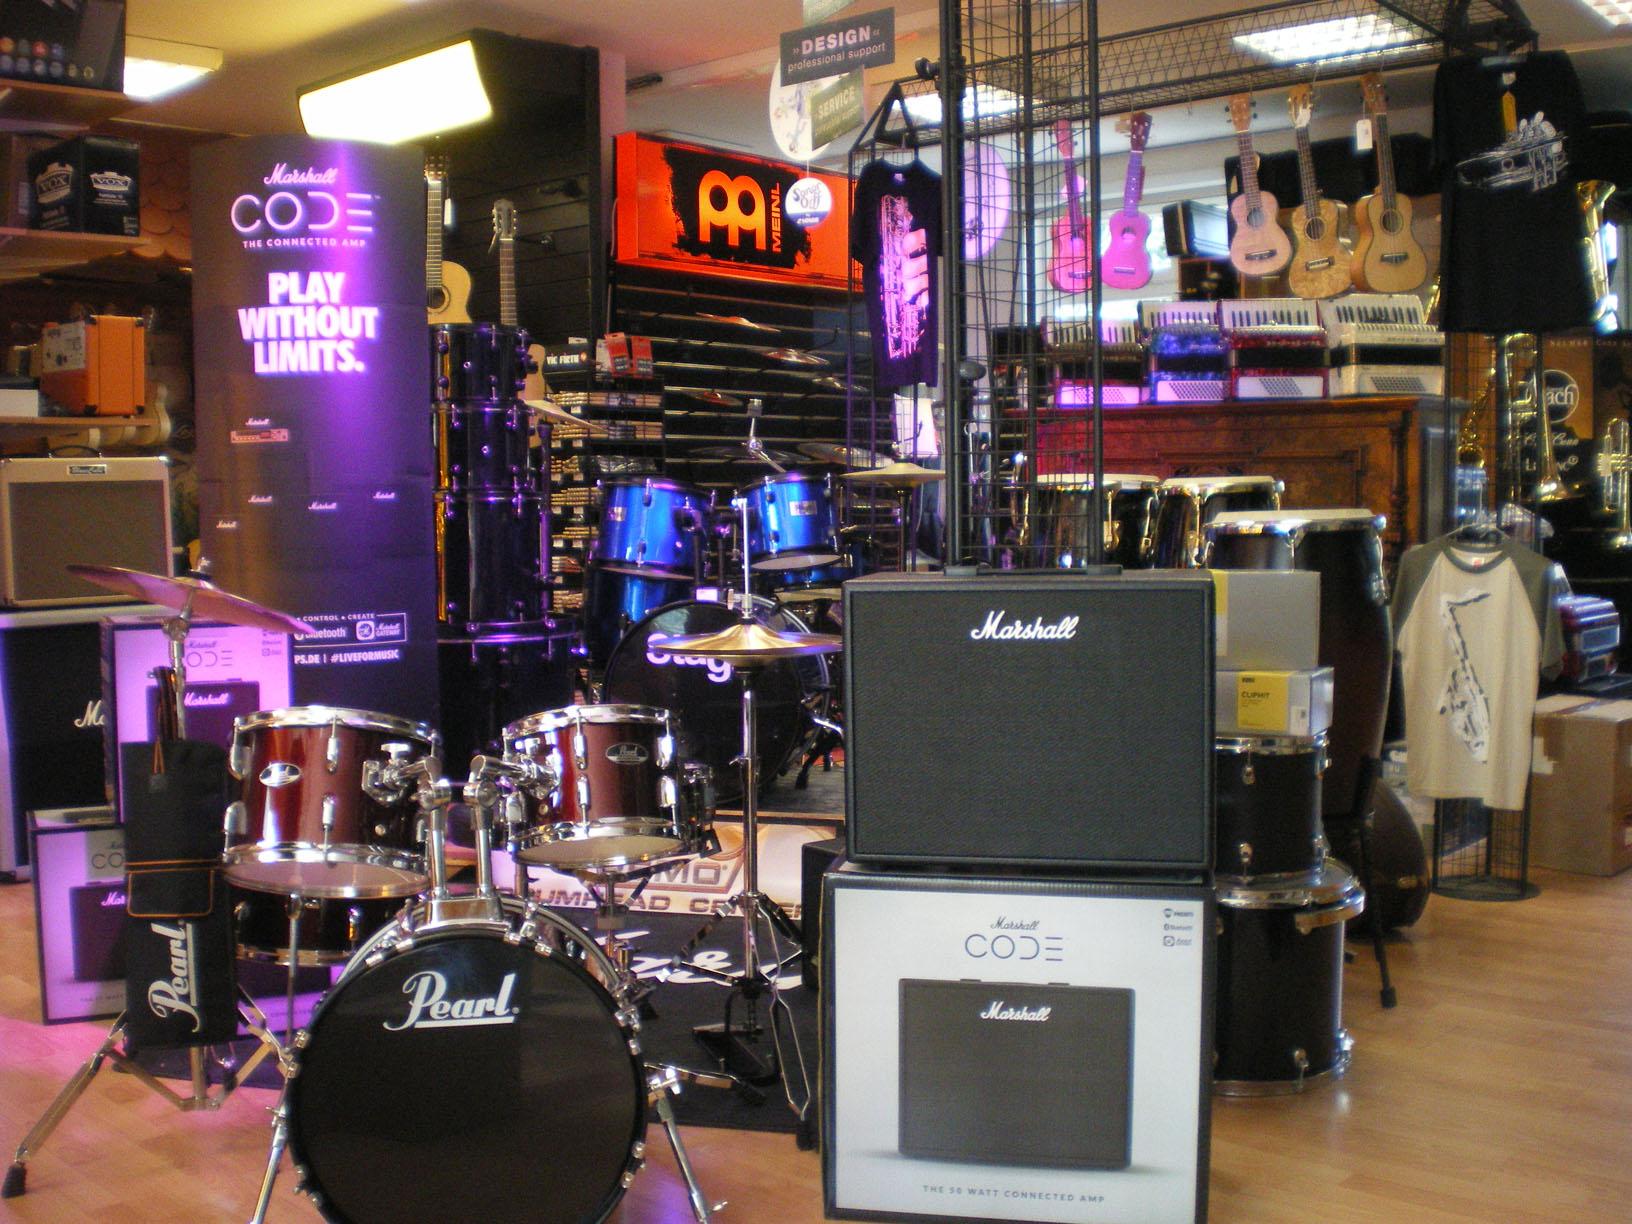 http://www.musikhaus-syhre.de/wordpress/wp-content/uploads/2017/06/6.jpg